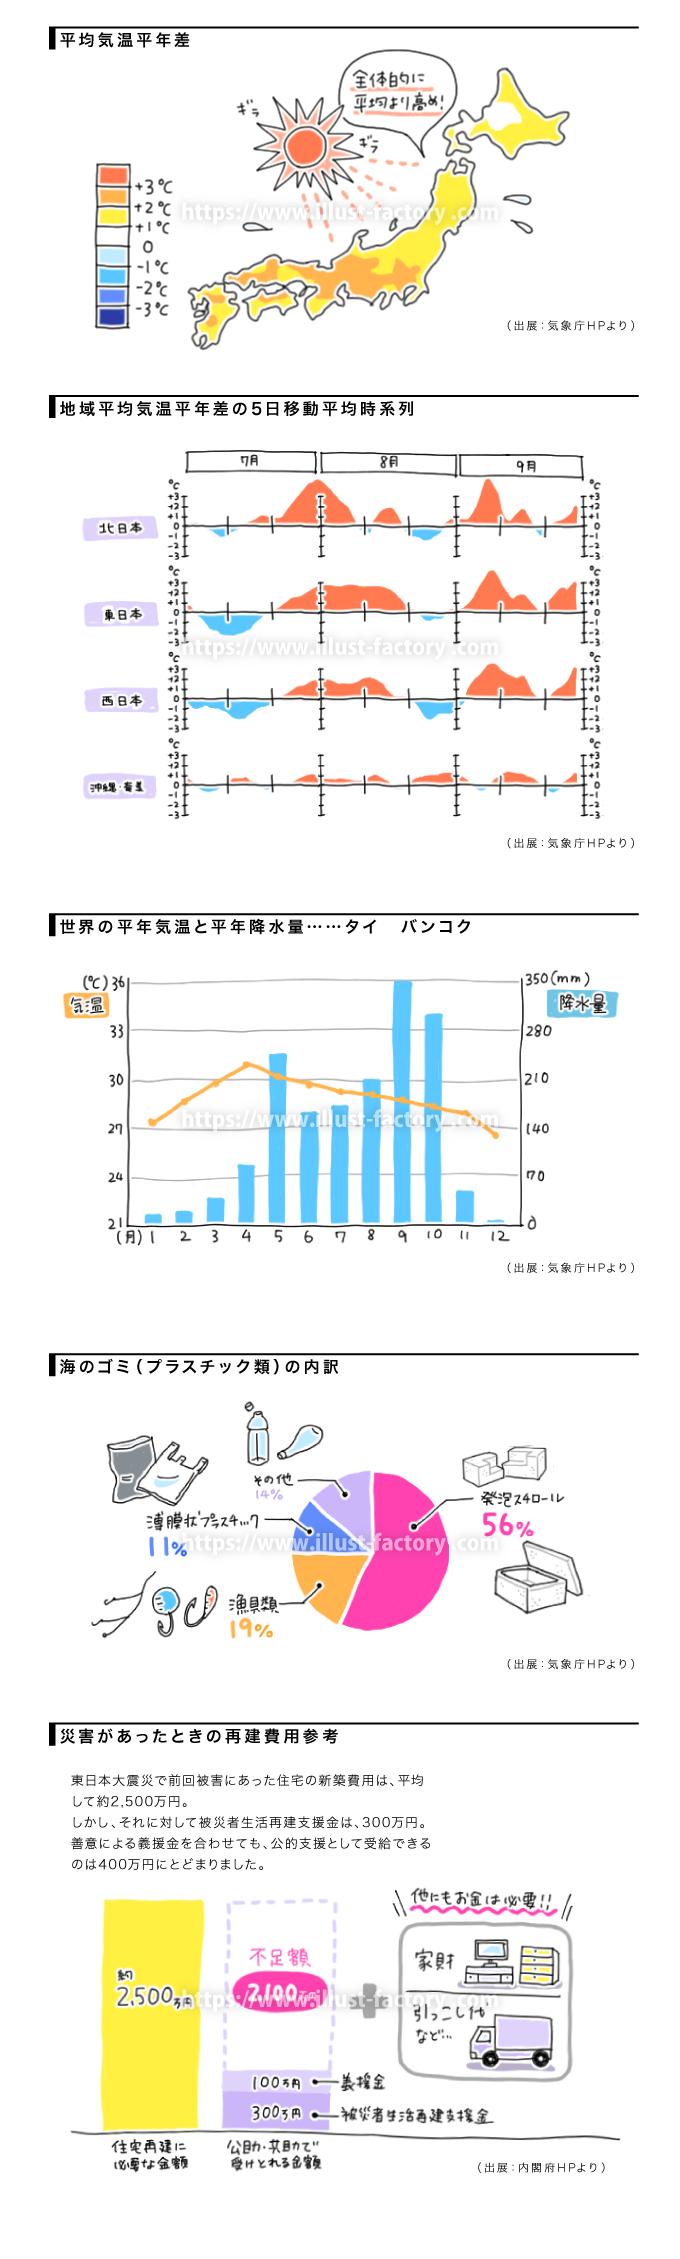 H123 手描き図解・グラフ